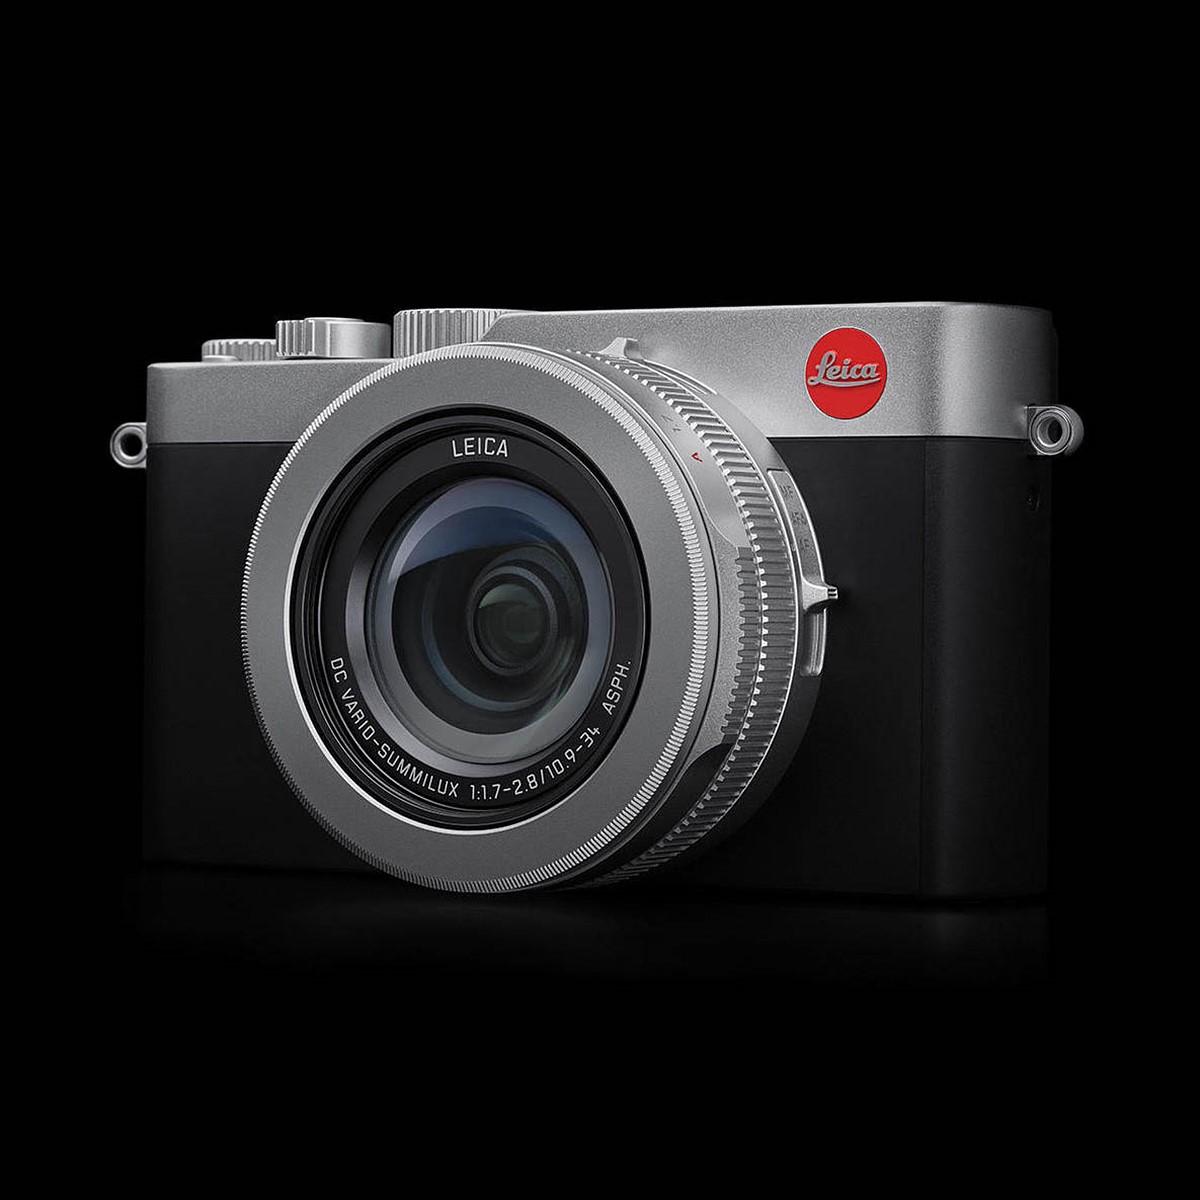 cf4d7510b73242 Leica announces the D-Lux 7